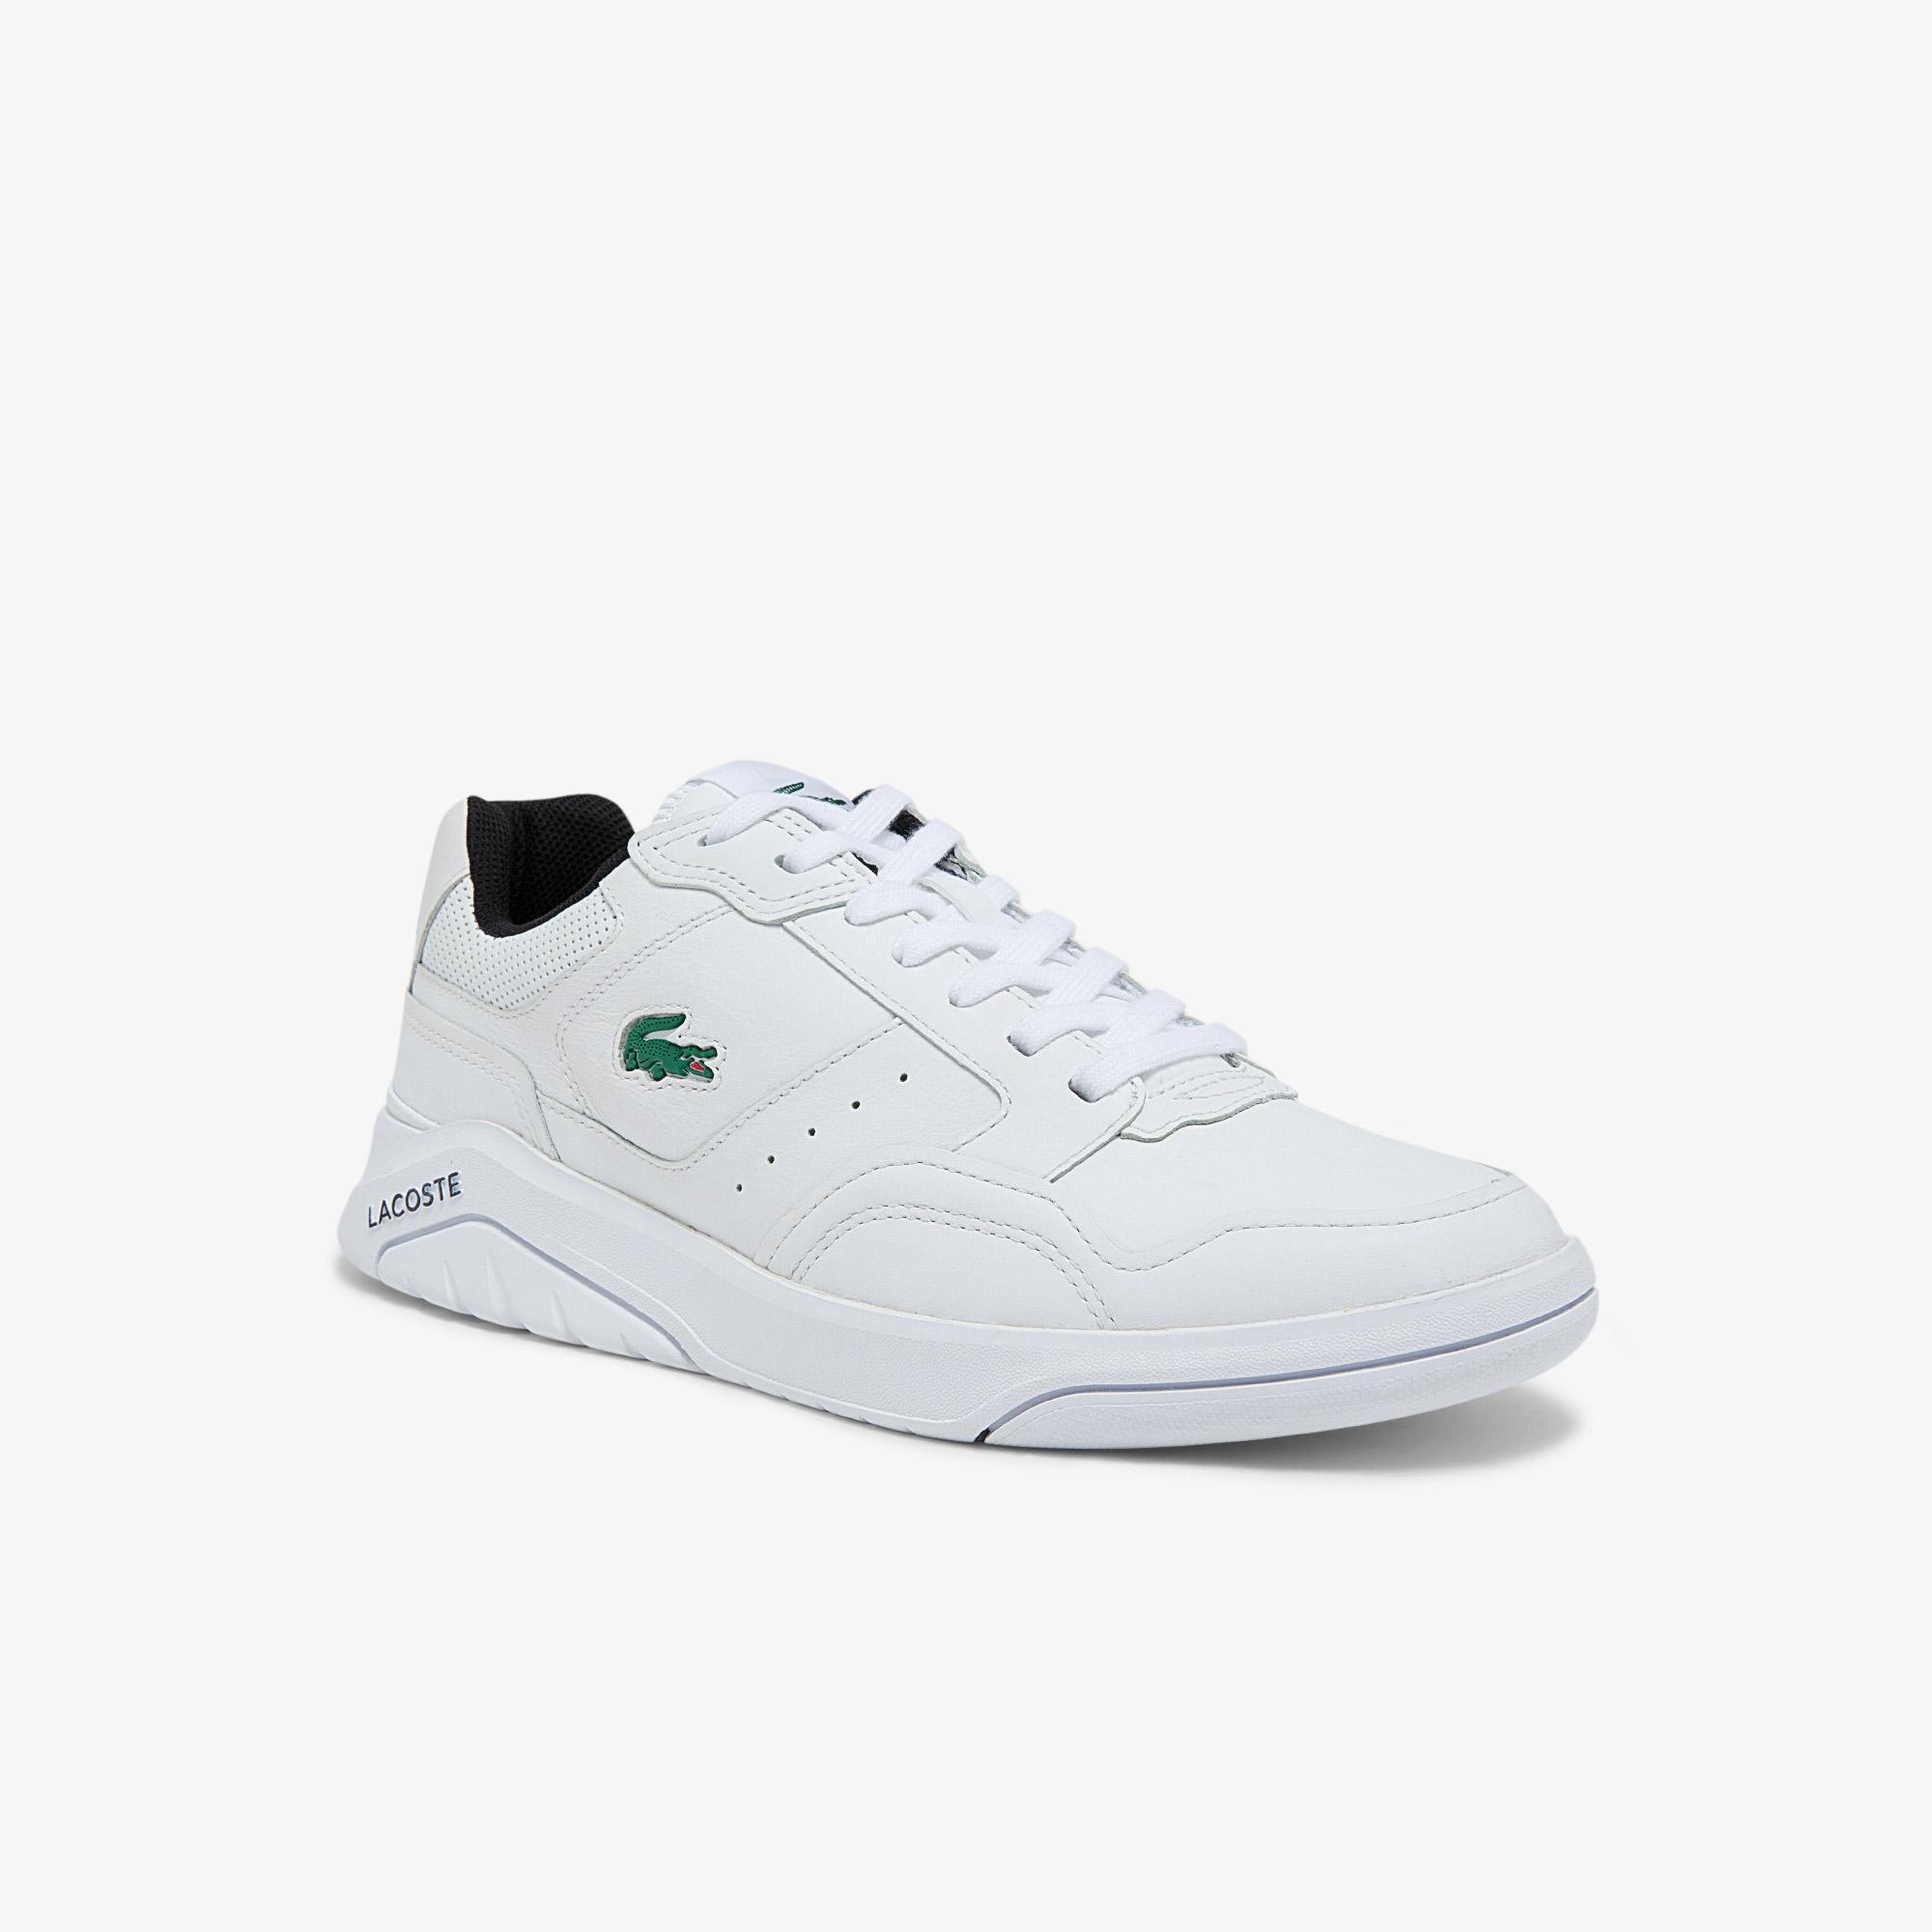 Lacoste Game Advance Luxe01212Sma Erkek Deri Beyaz - Siyah Sneaker